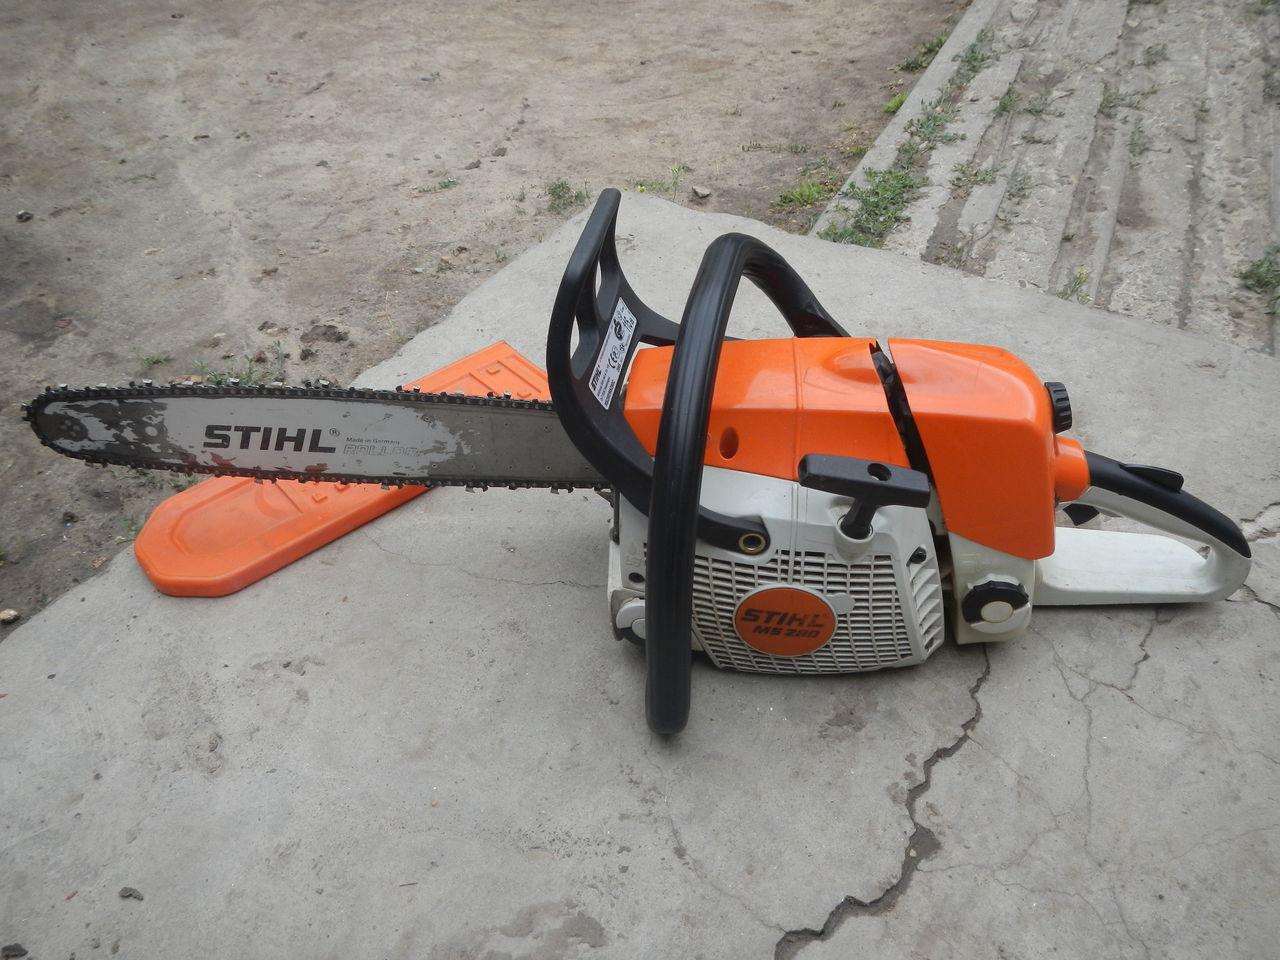 Бензопила stihl ms 280: обзор, характеристики, отзывы